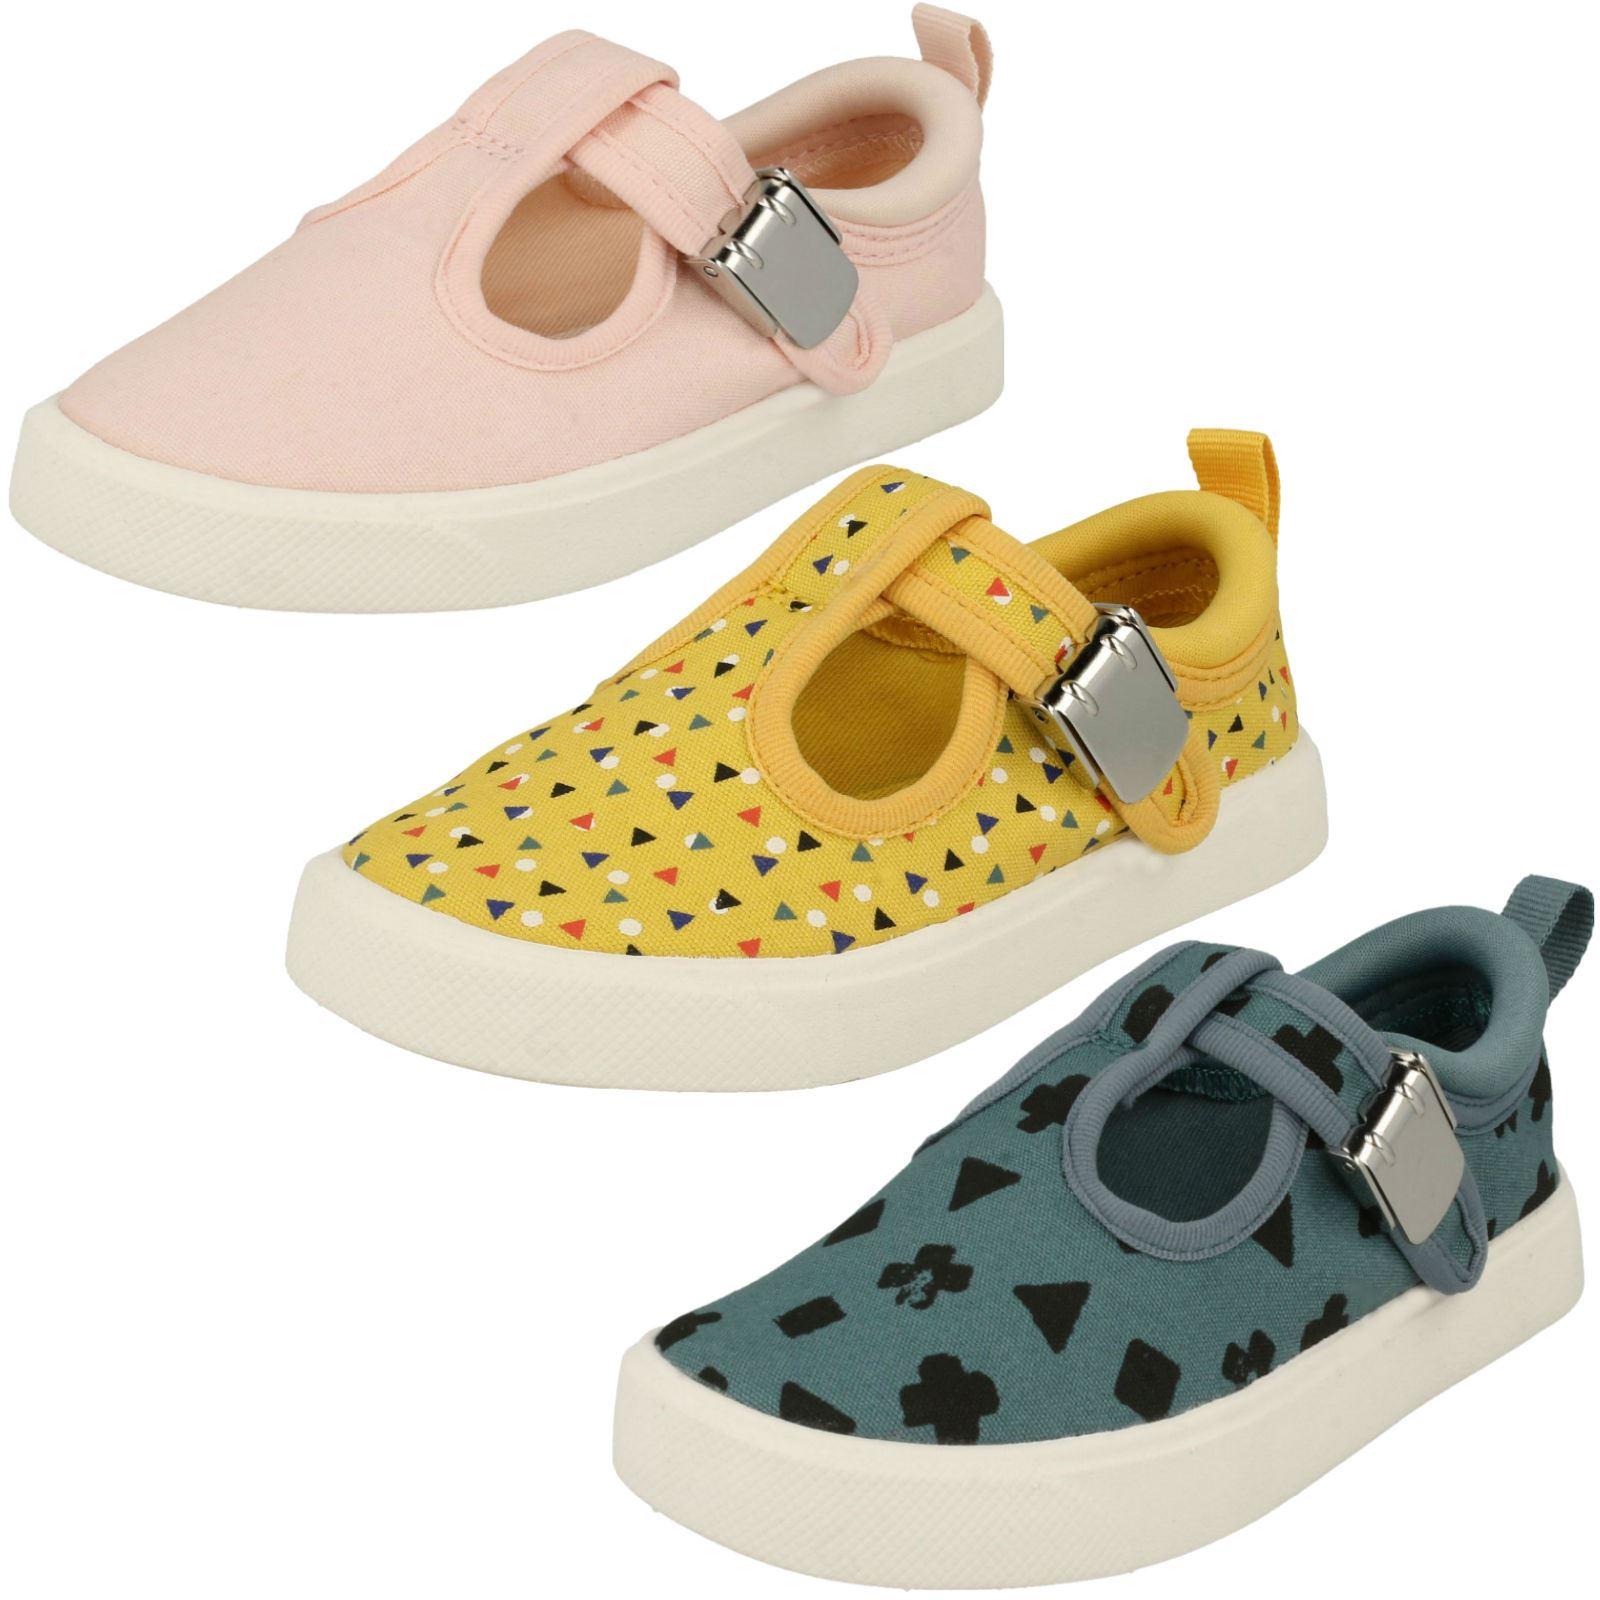 Childrens Boys Girls Clarks T-bar Canvas Shoes *city Spark*